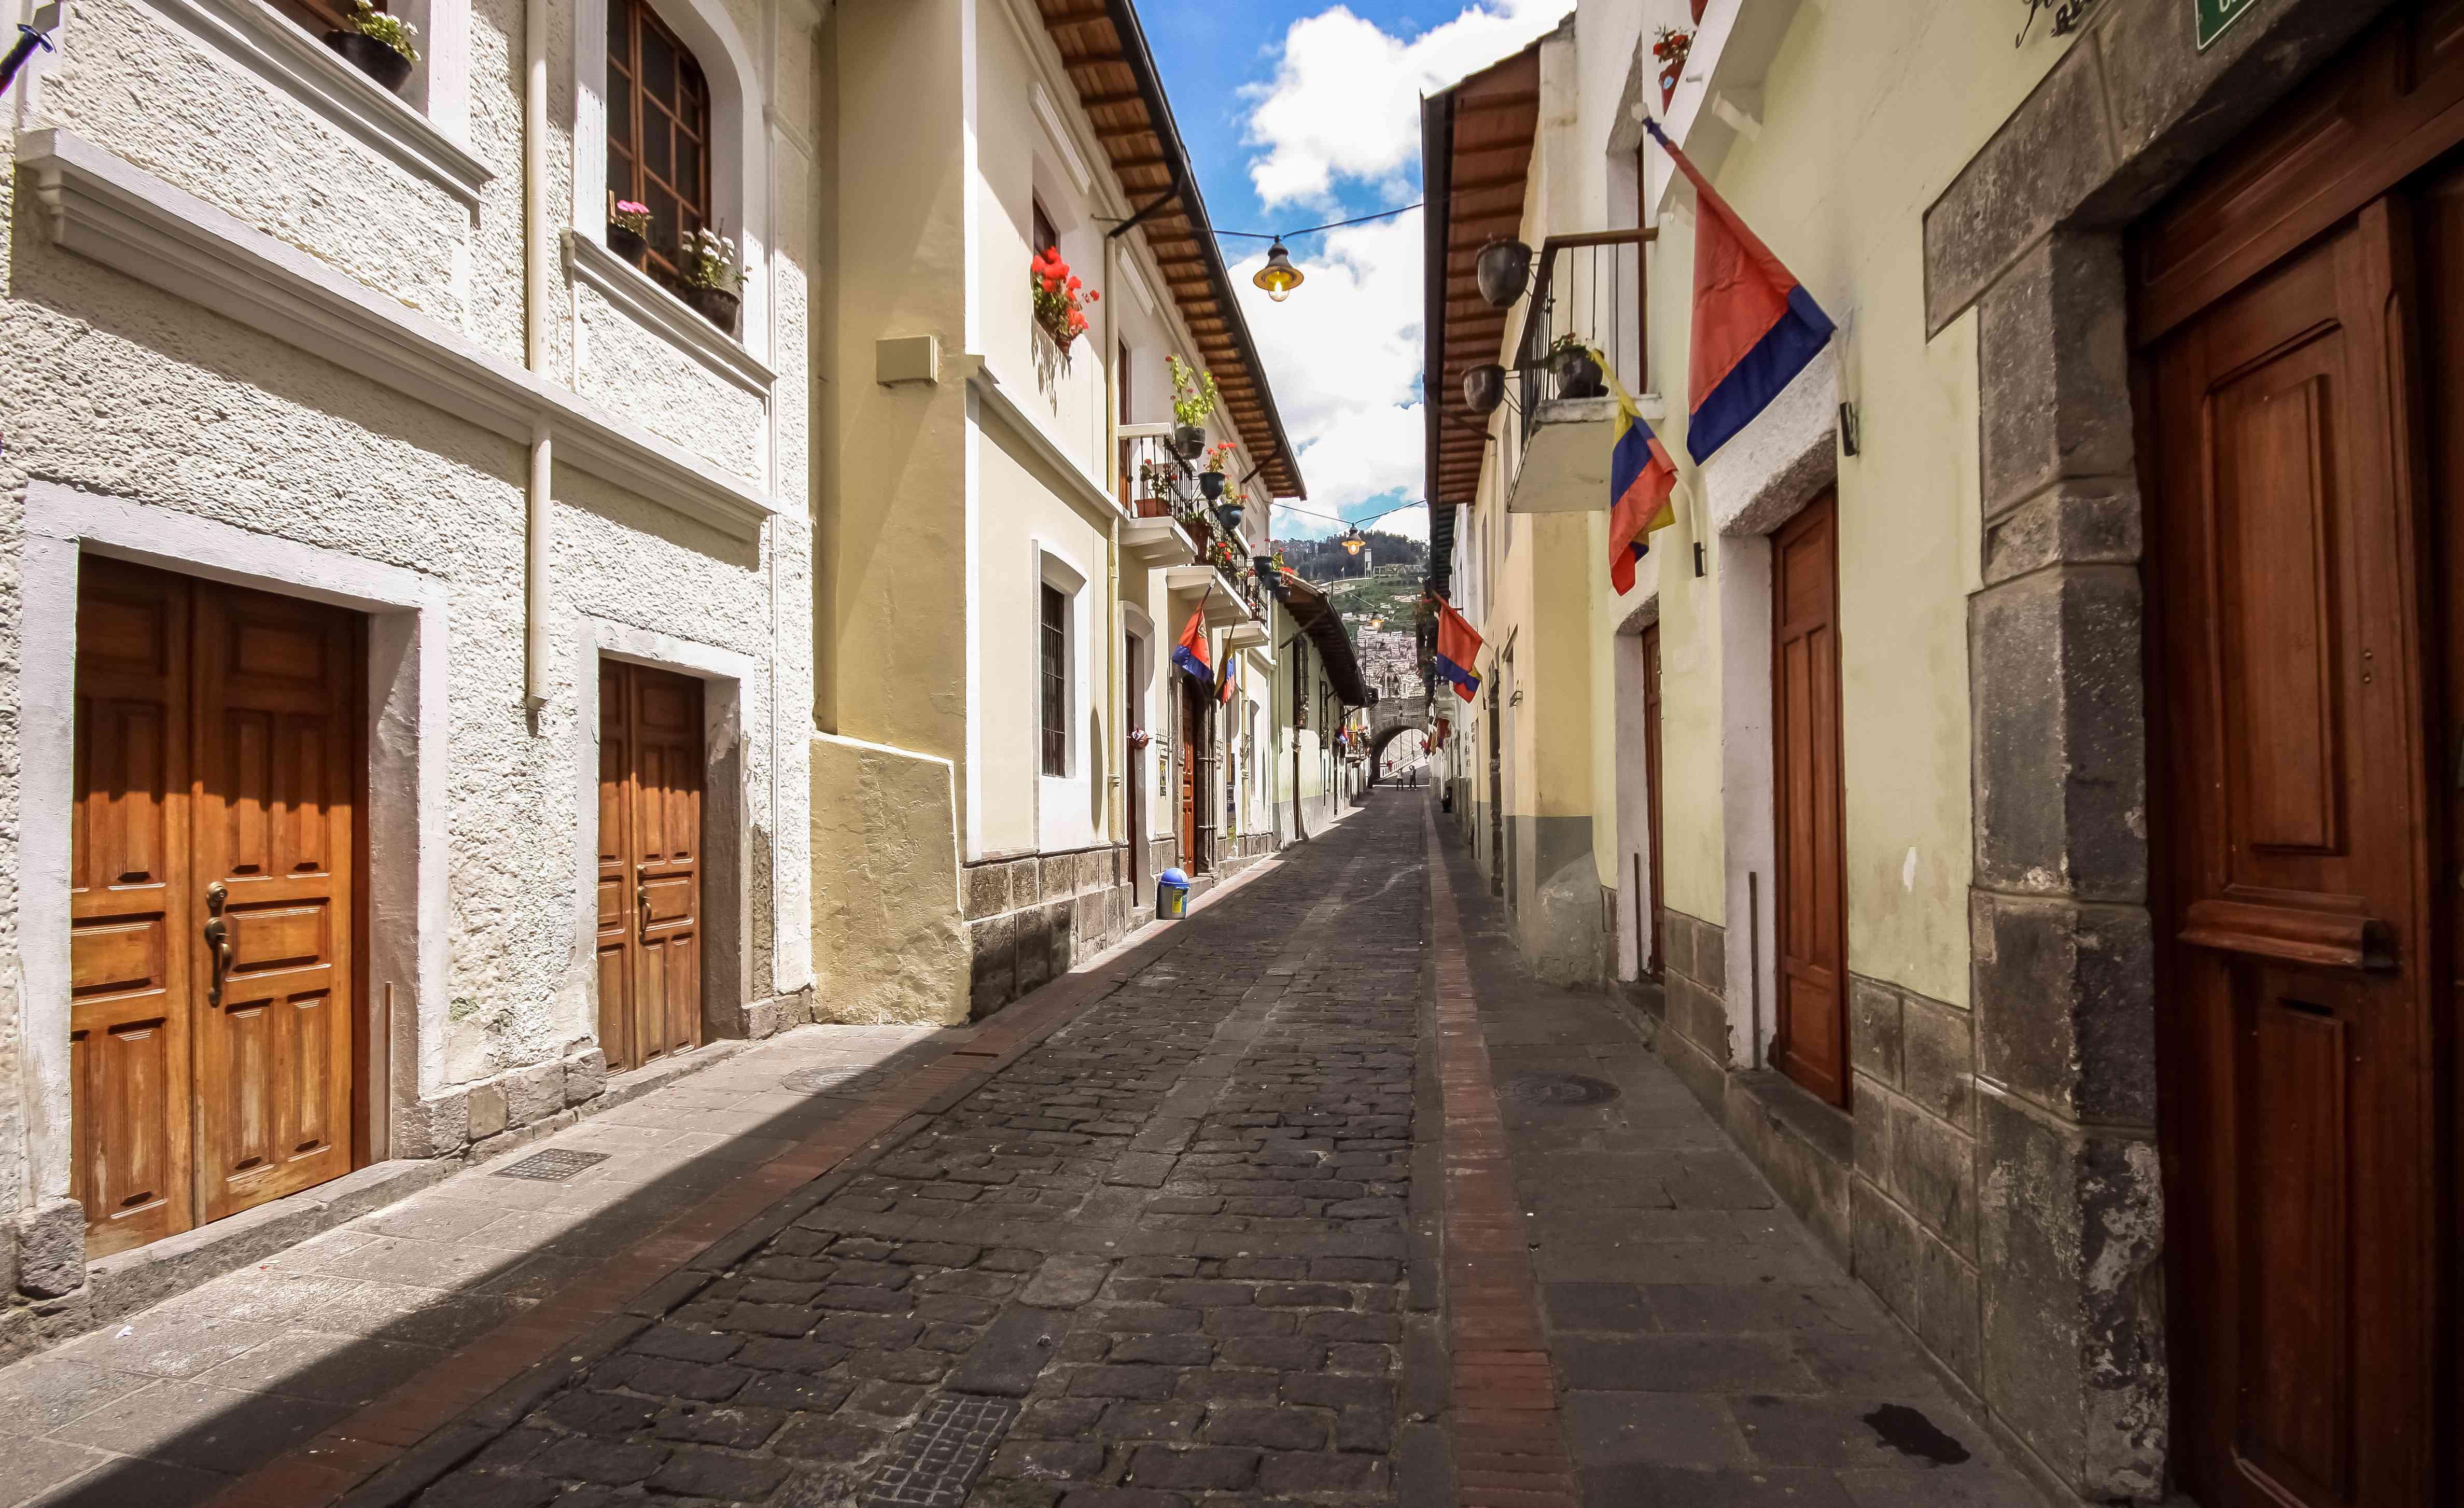 Calle La Ronda, typical colonial street in historic district, Quito